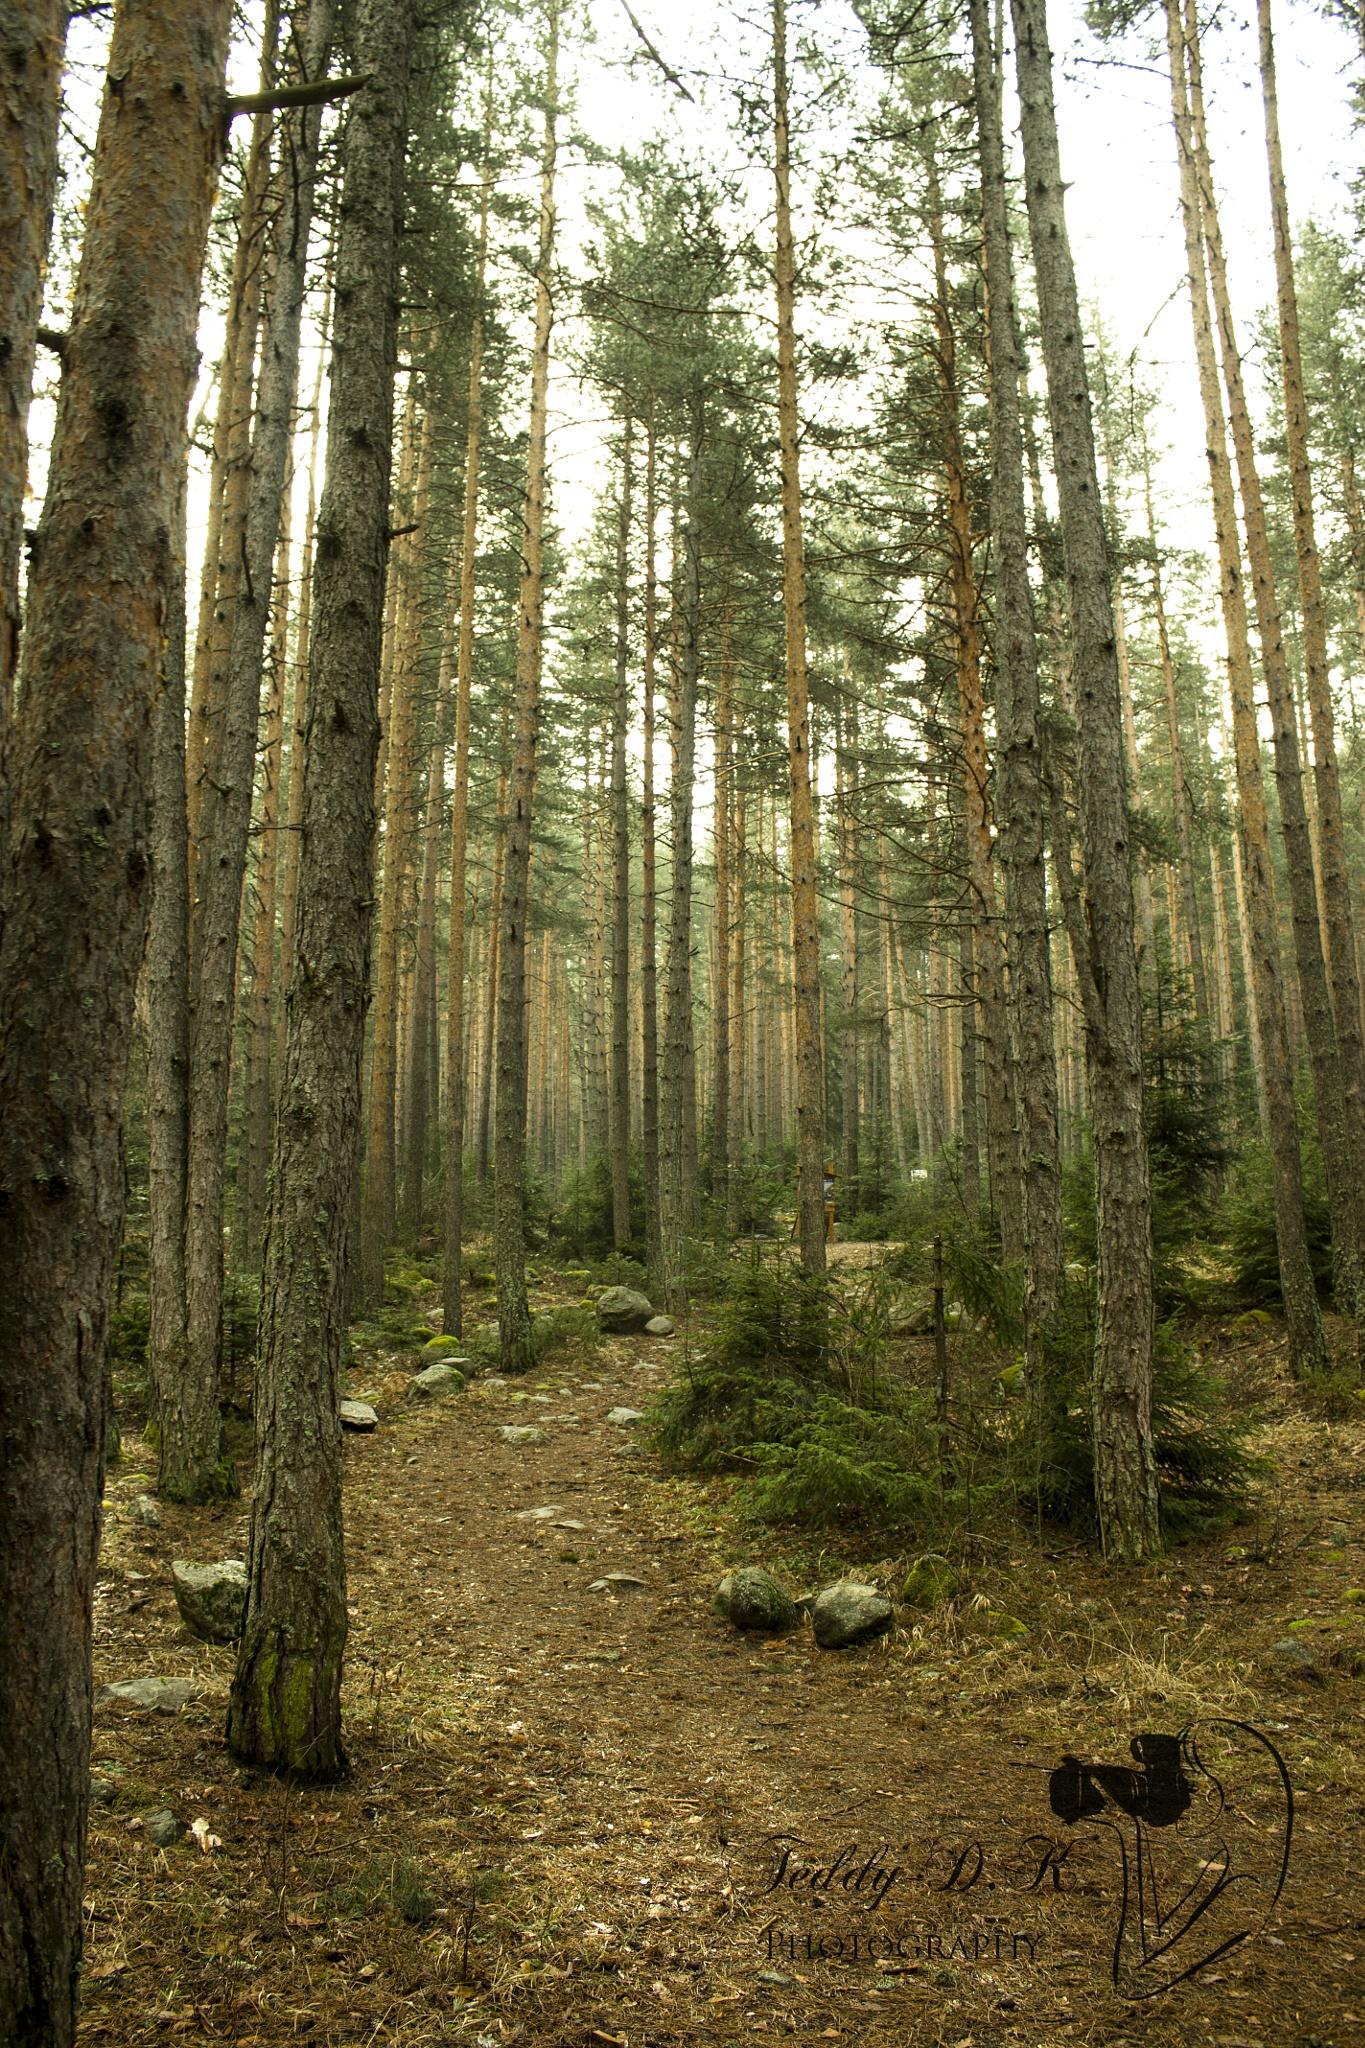 The magic forest by Teodora Simeonova